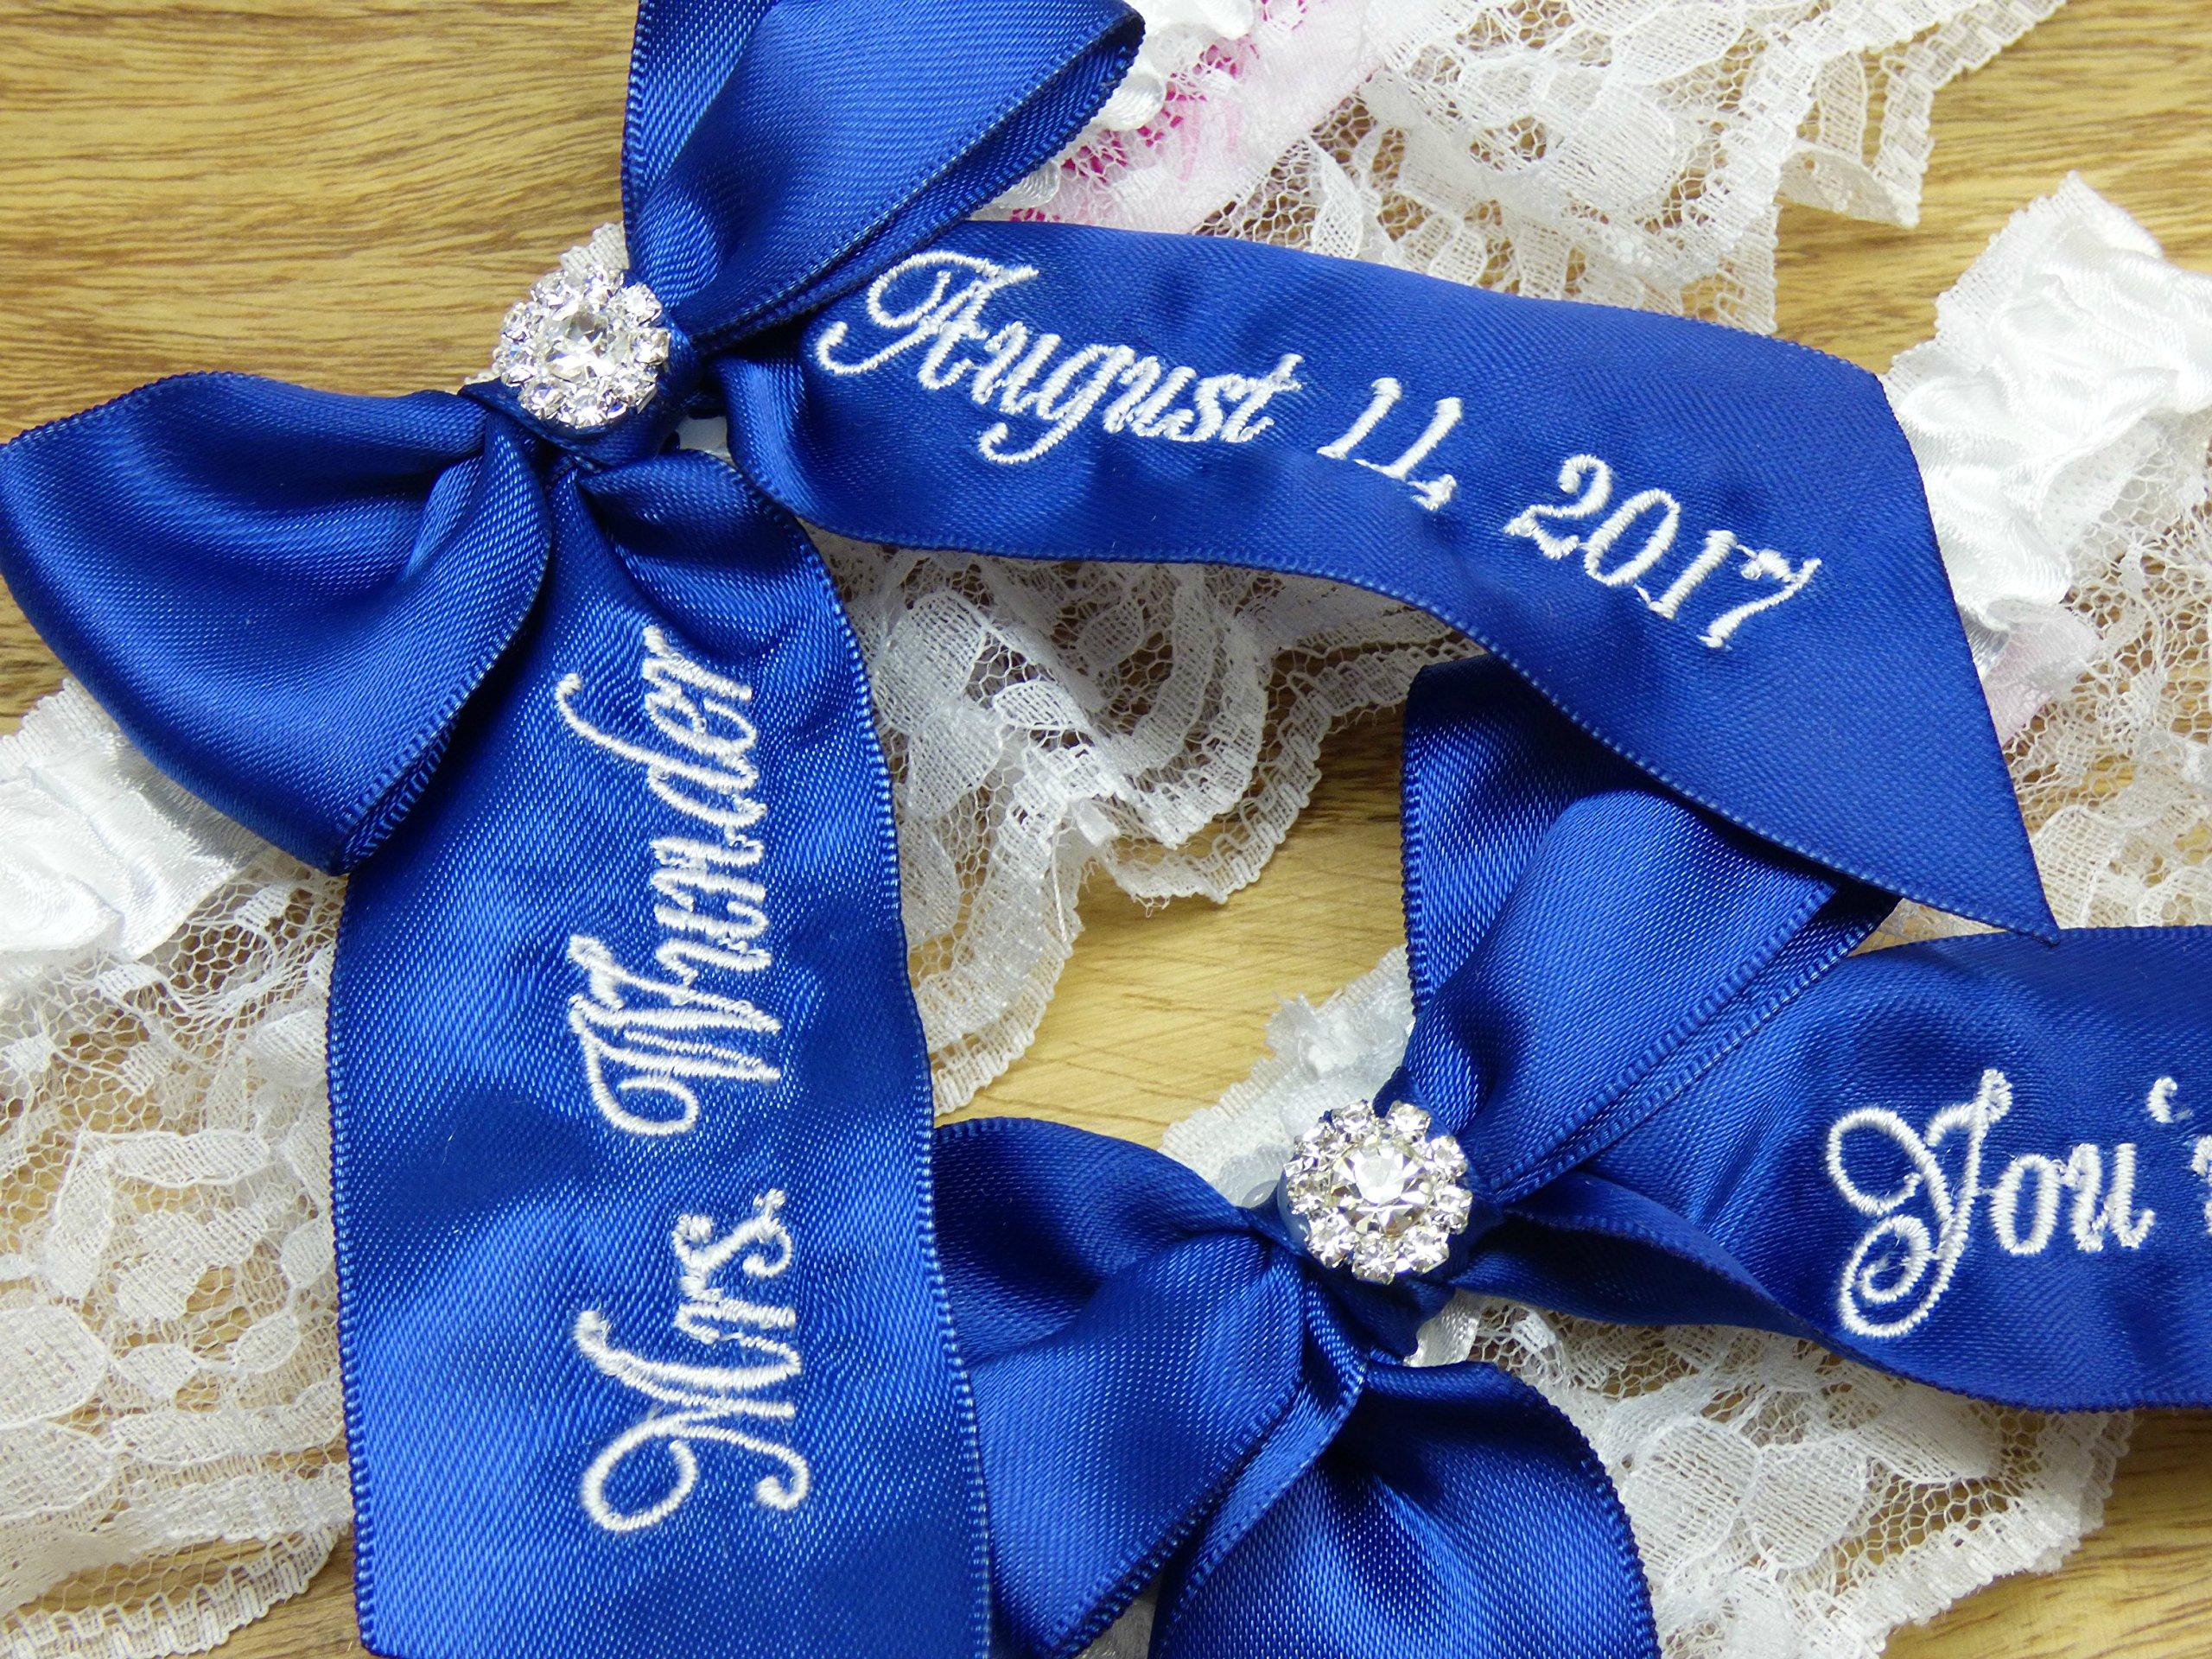 Navy Blue Bridal Garter, Nice Catch - You're Next Wedding Garter Set, Custom Garters, Something Blue